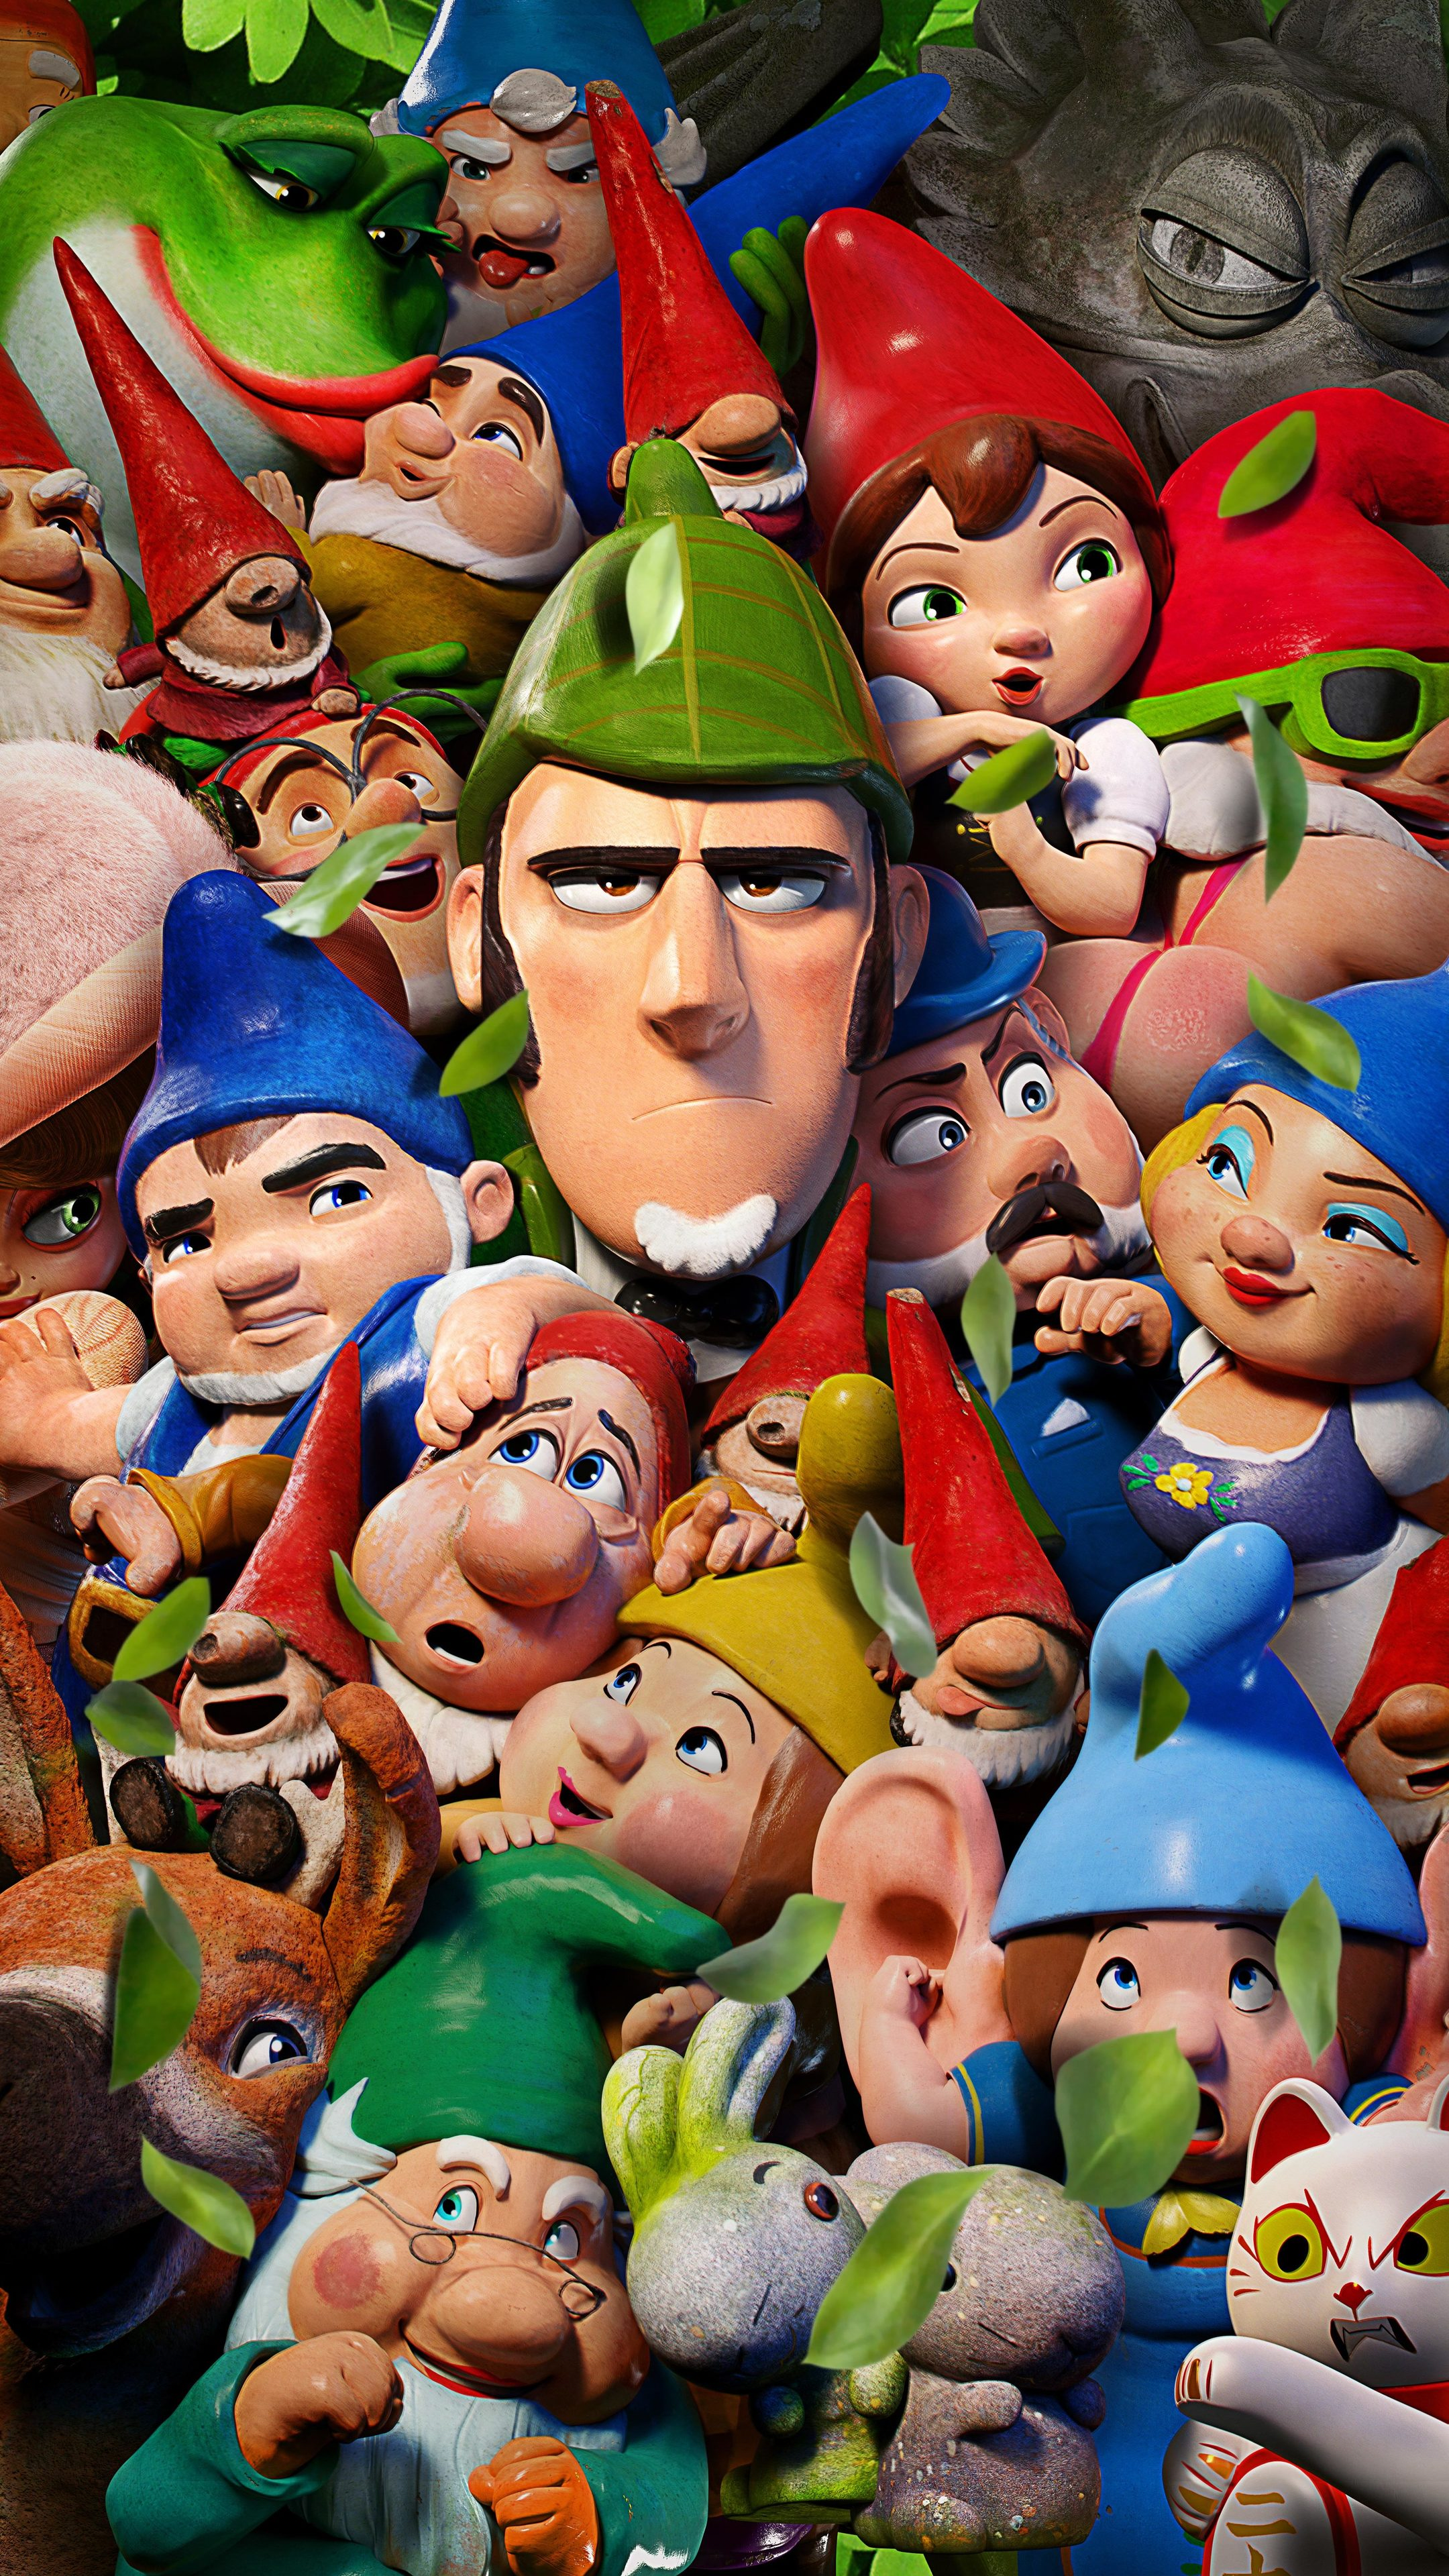 انیمیشن شرلوک گنومز Sherlock Gnomes 2018